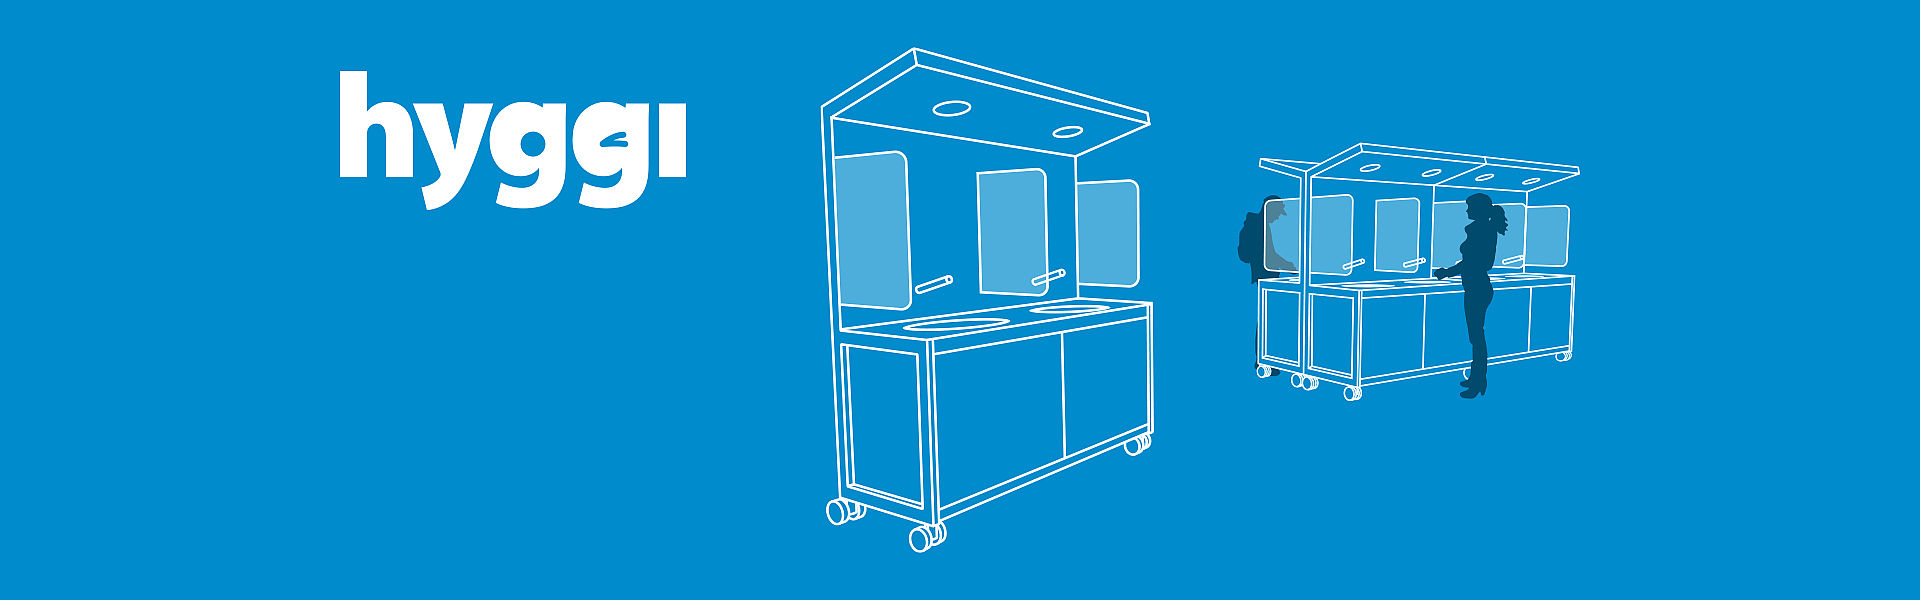 Bild: Hyggi – Die mobile Hygienestation